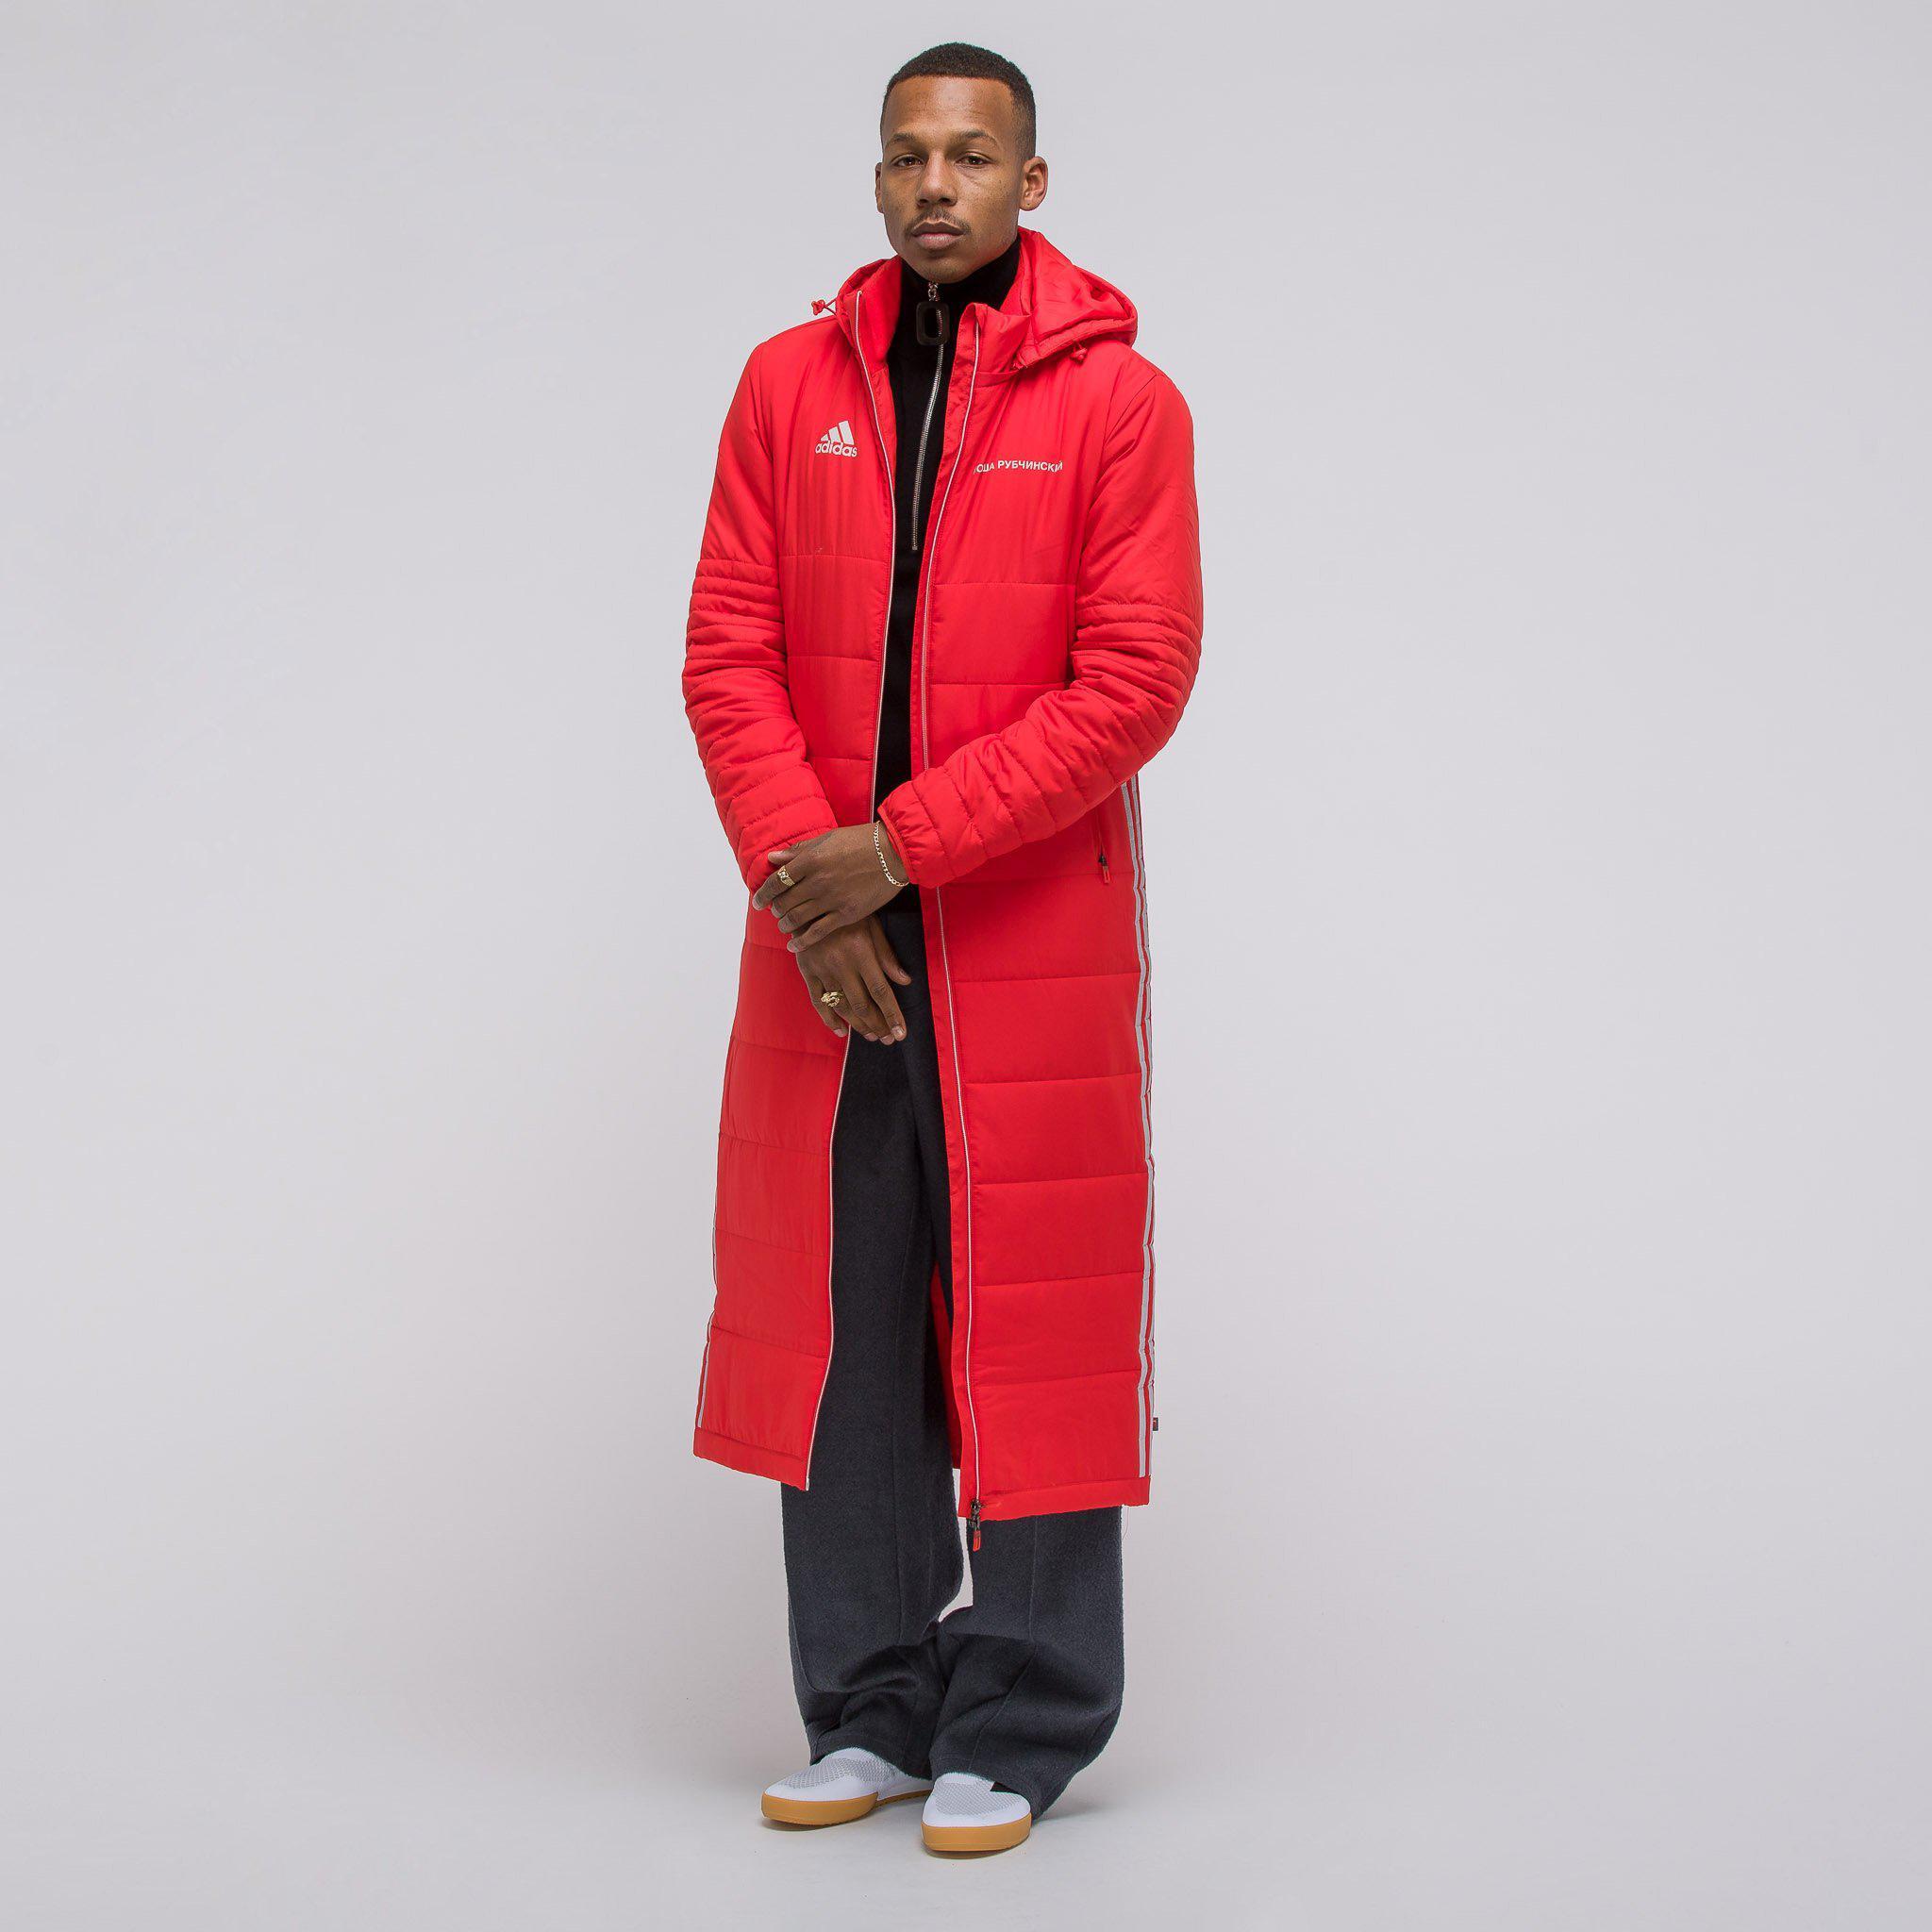 7301495338c7 Lyst - Gosha Rubchinskiy X Adidas Wind Coat In Red in Red for Men